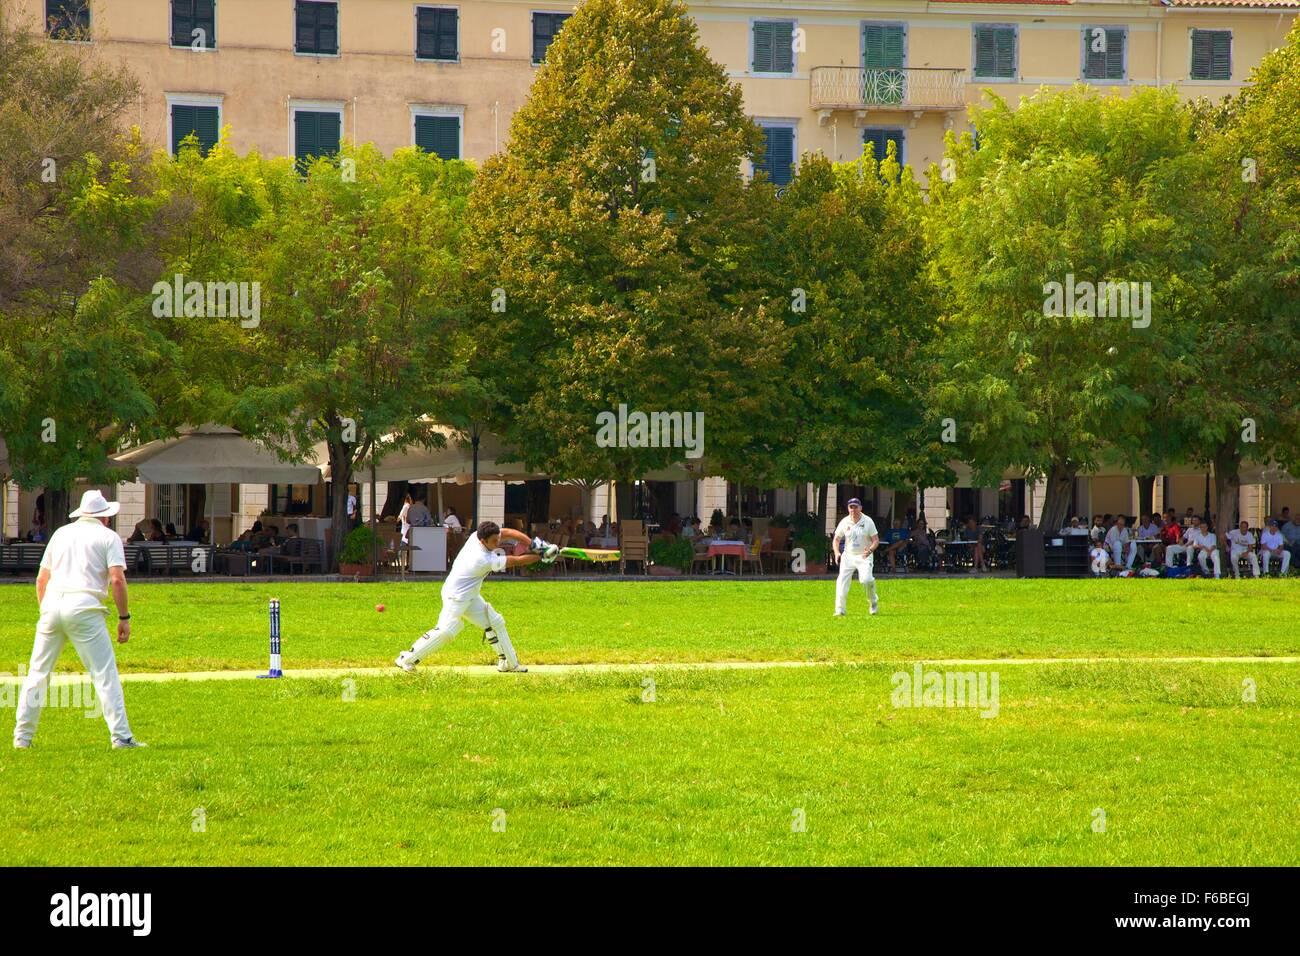 Game Of Cricket, Corfu Old Town, Corfu, The Ionian Islands, Greek Islands, Greece, Europe - Stock Image